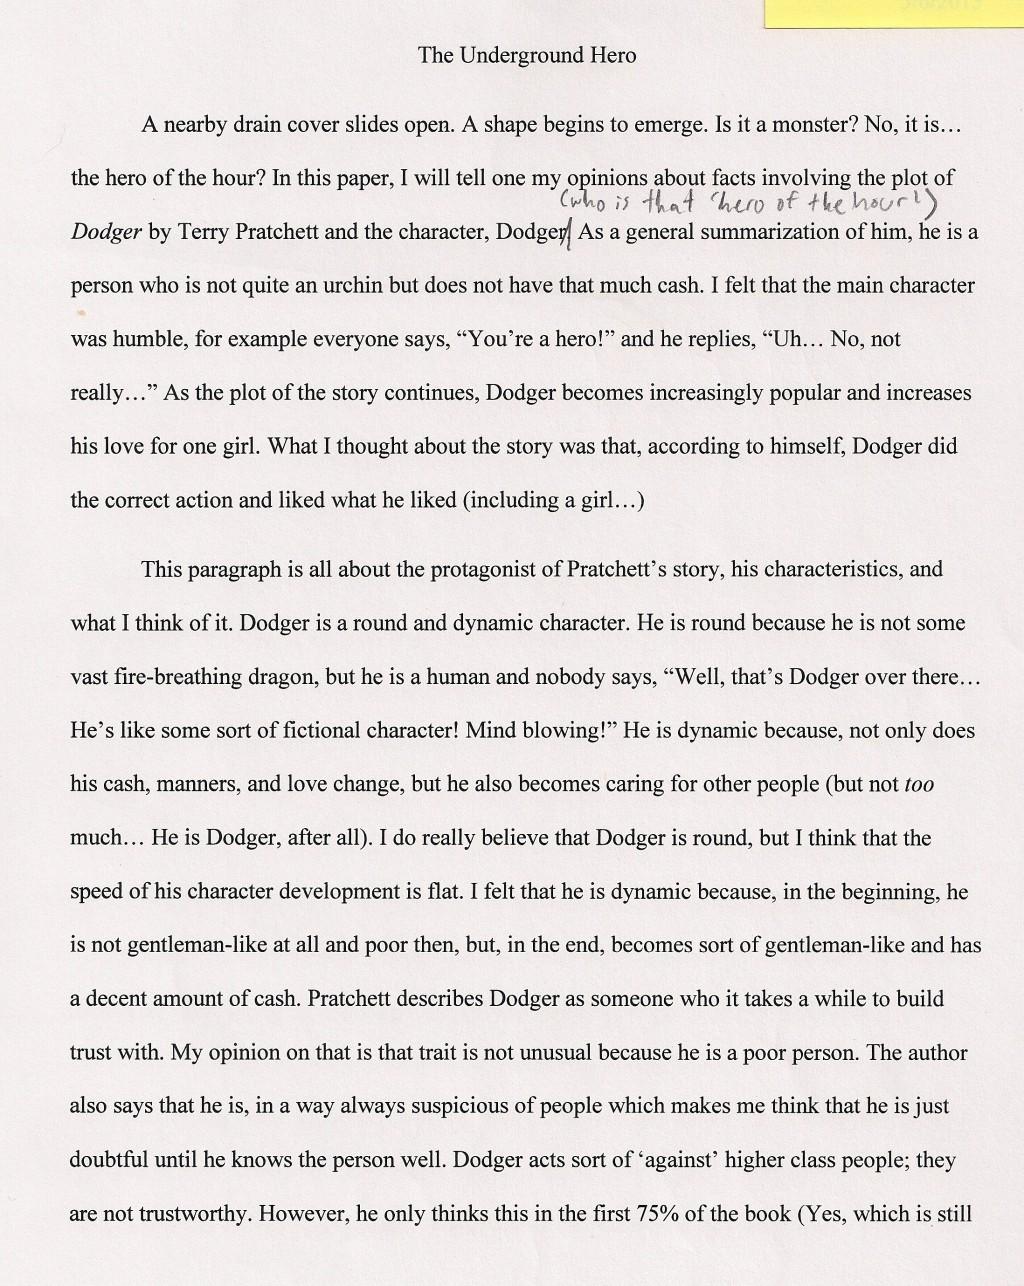 001 Heros Essay Example The Underground Hero Beautiful Hero's Journey Titles Heroes Robert Cormier Questions Outline Large